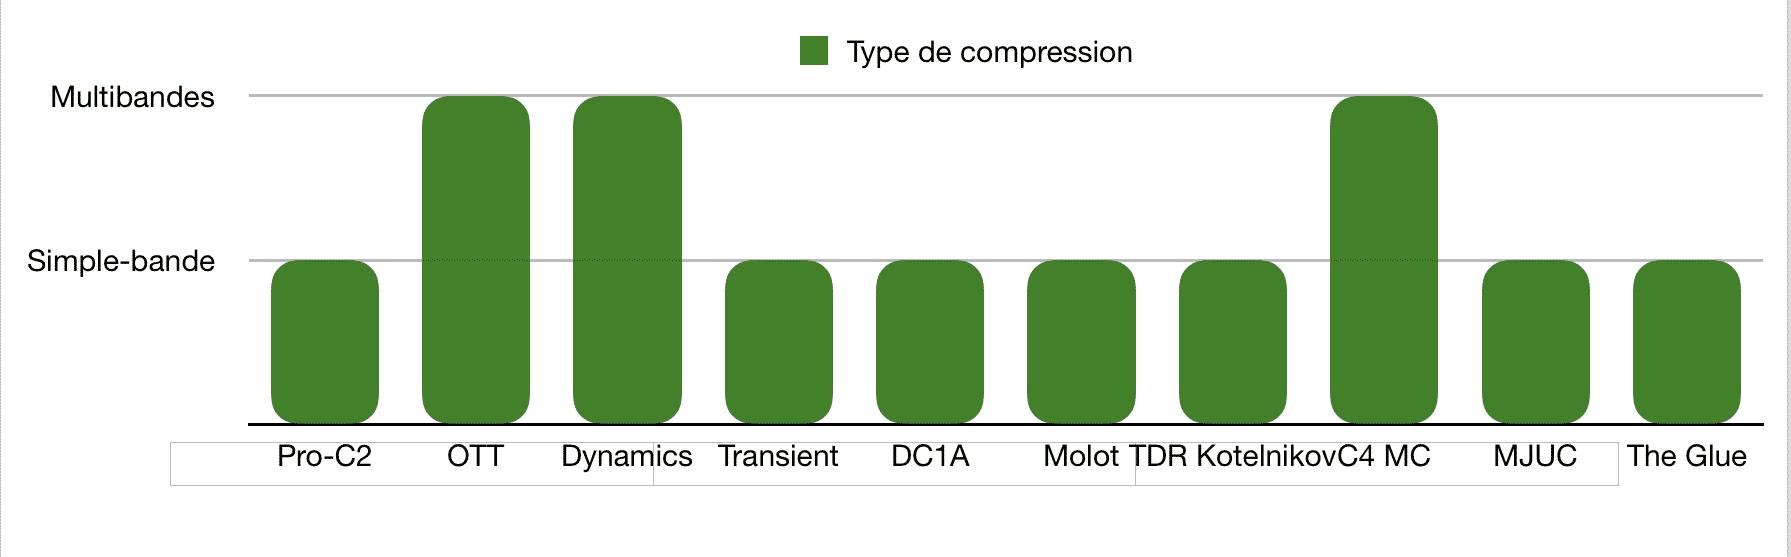 Type de compression - TOP 10 - Plugins - Compresseurs - WE COMPOZE